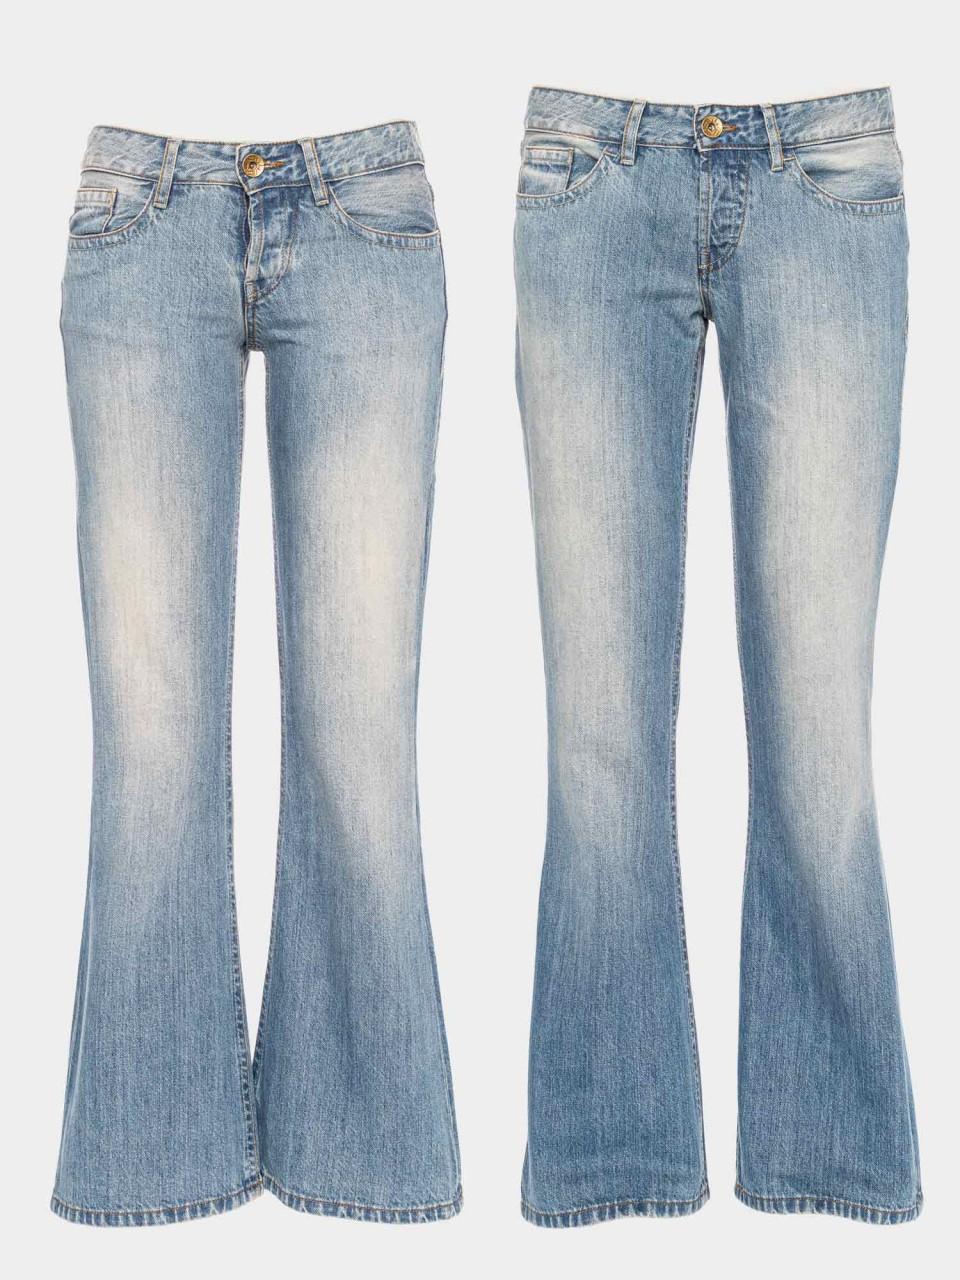 Jeans Fred GOTS RR2776 HBL USD